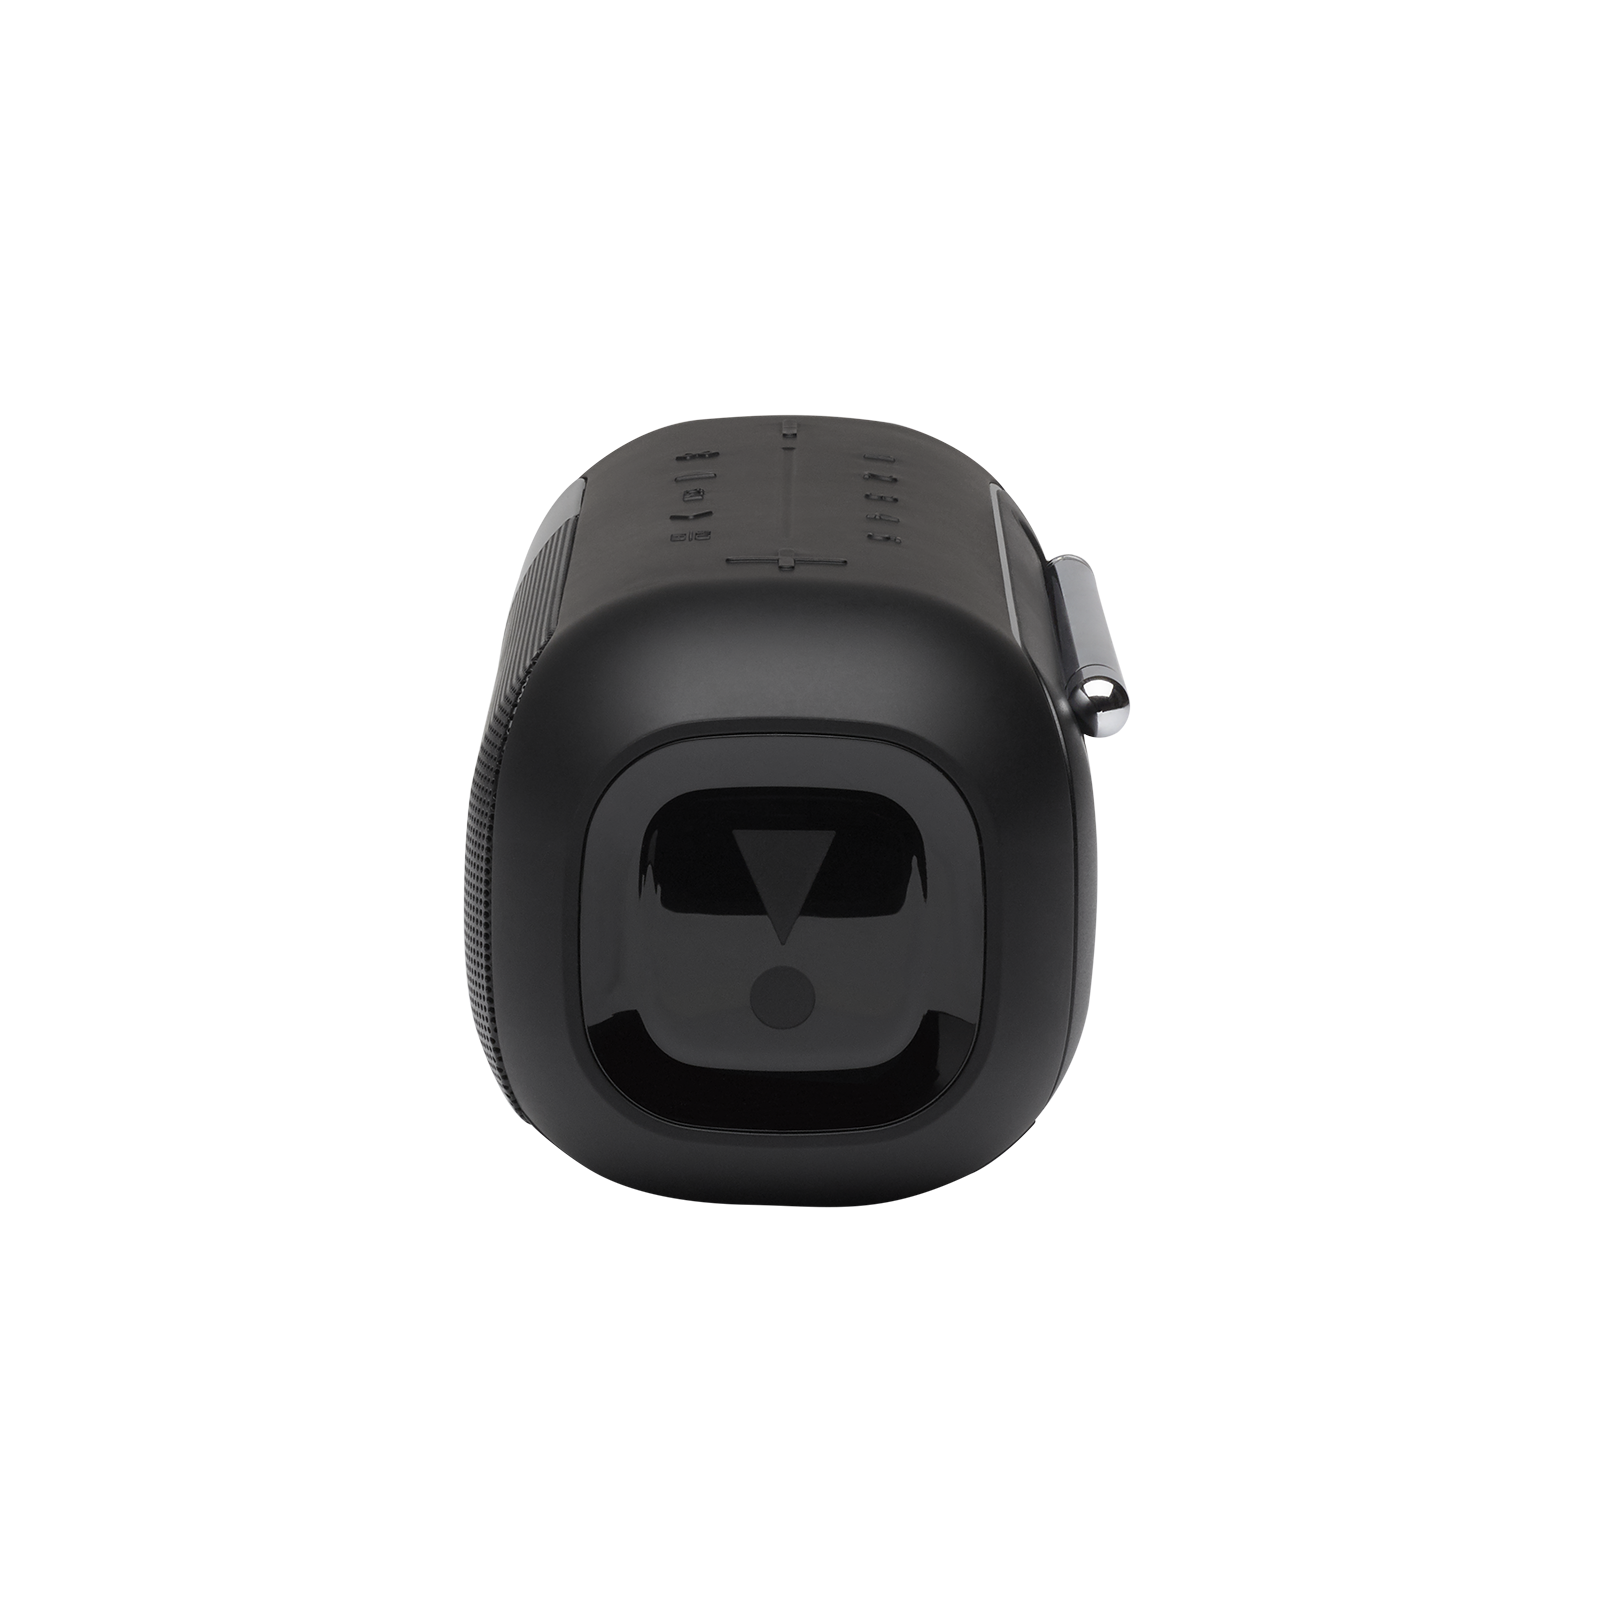 JBL Tuner 2 - Black - Portable DAB/DAB+/FM radio with Bluetooth - Left